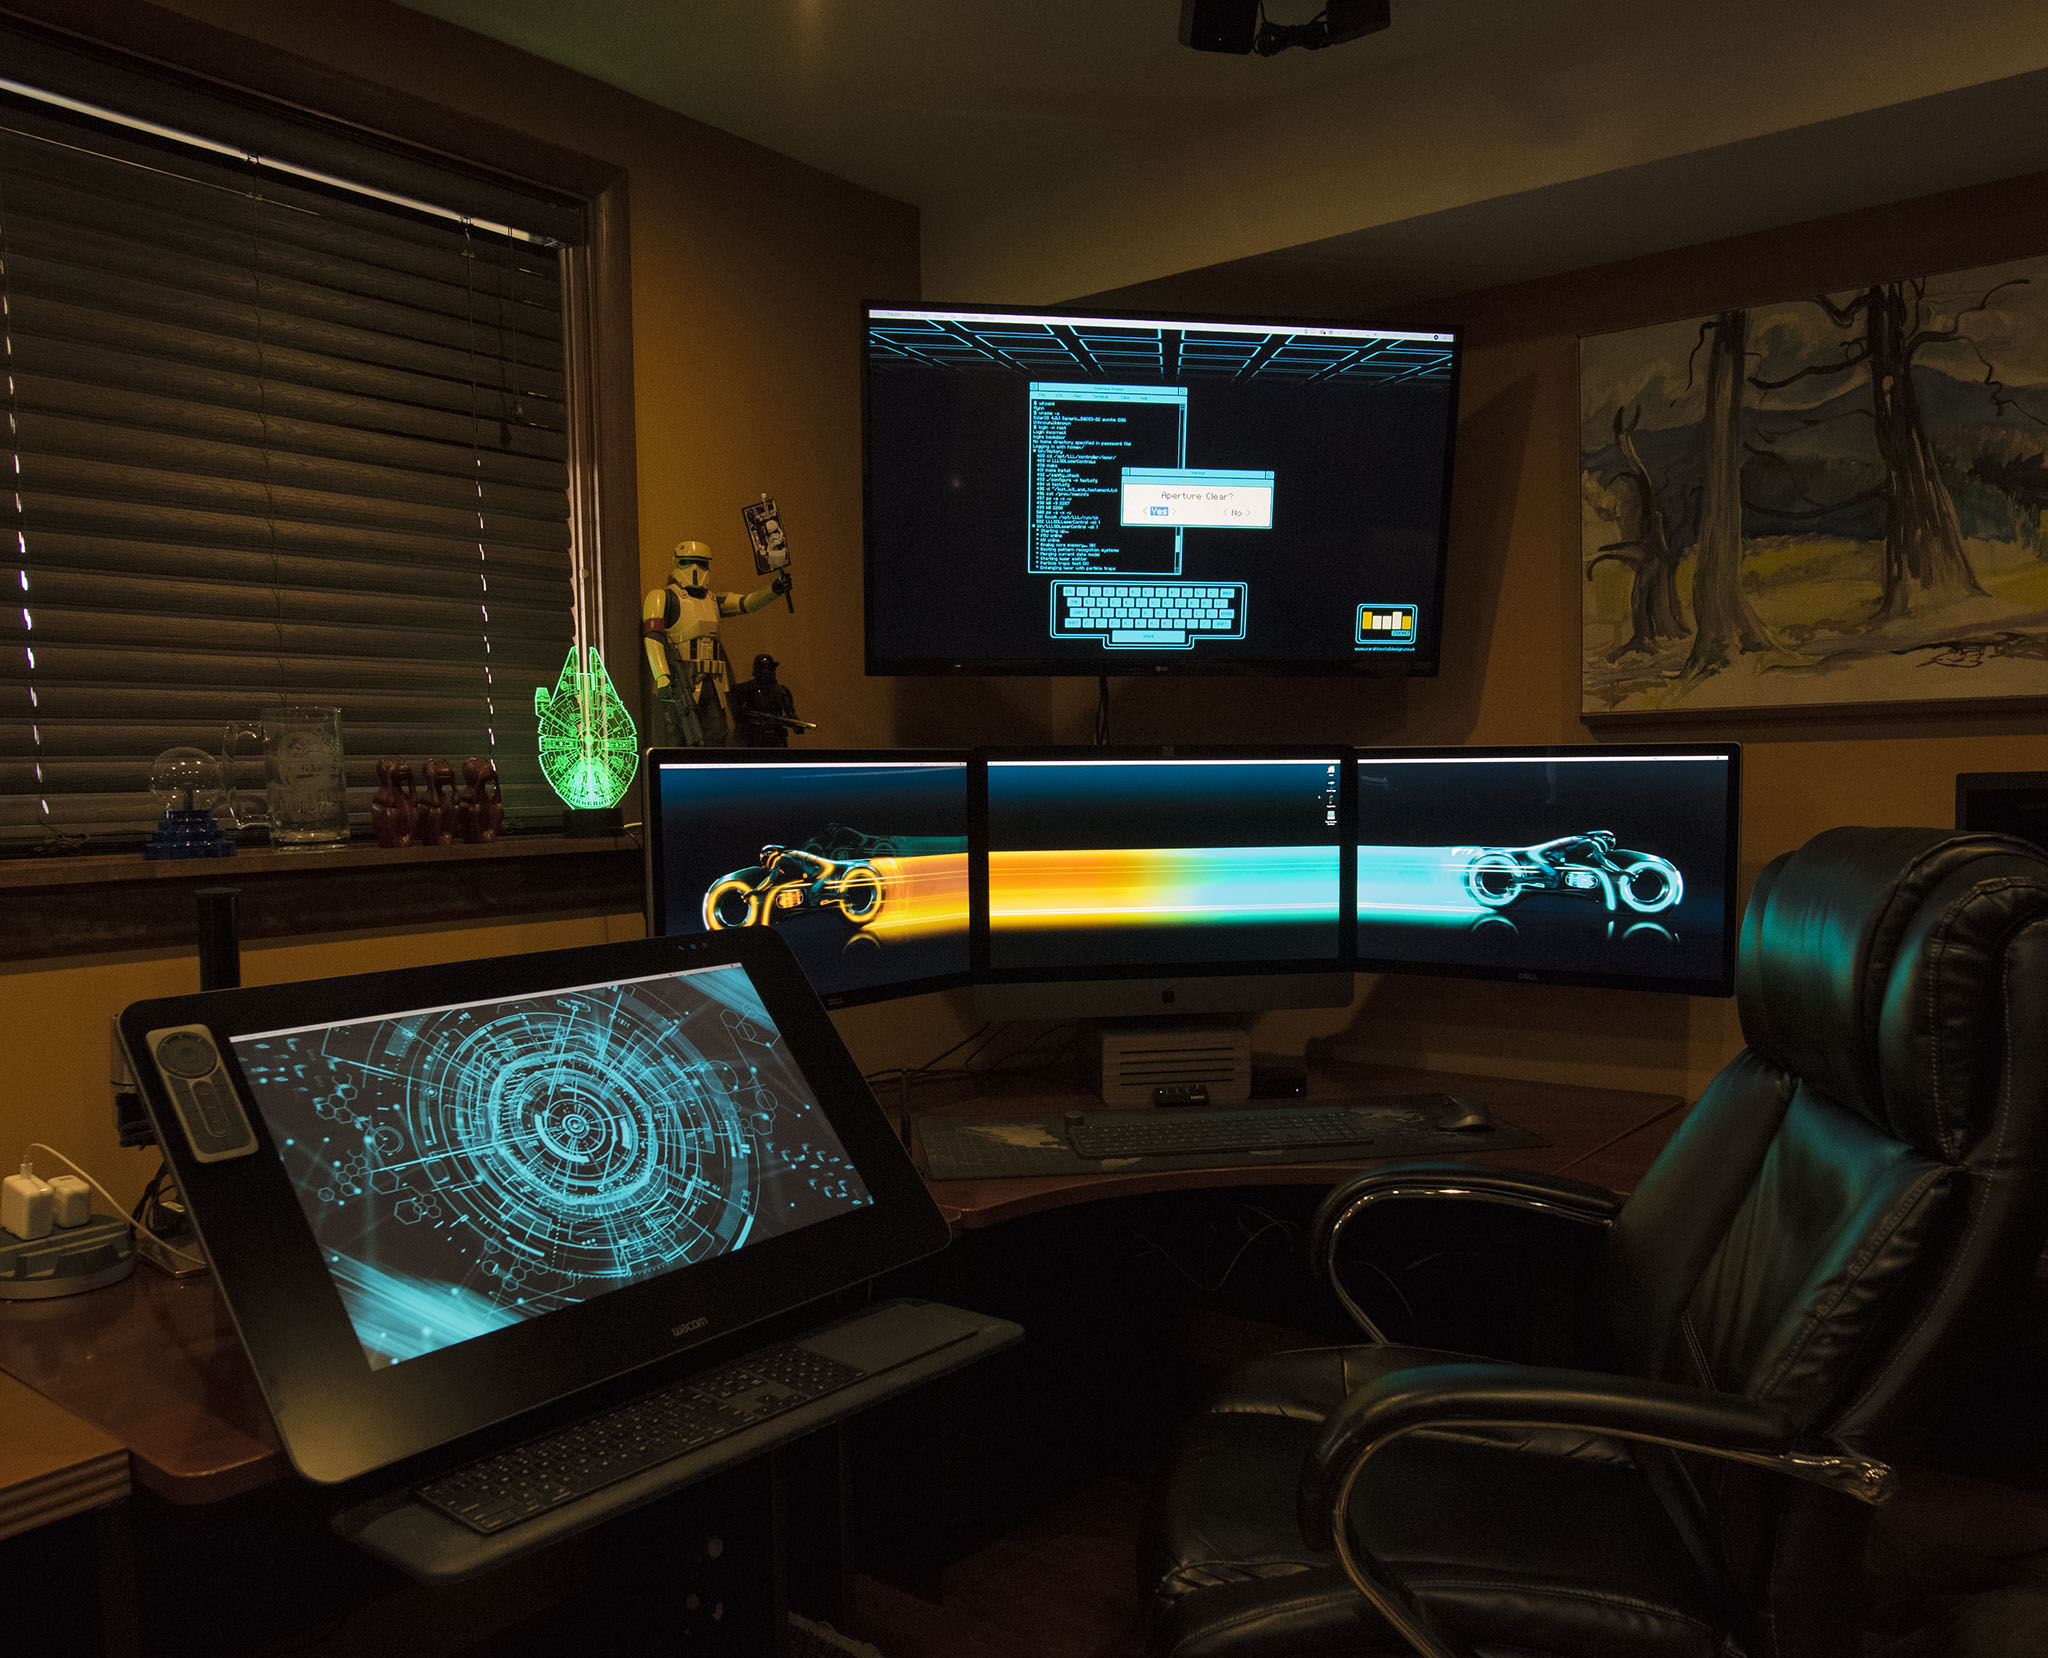 iMac Pro Setup 1.jpg